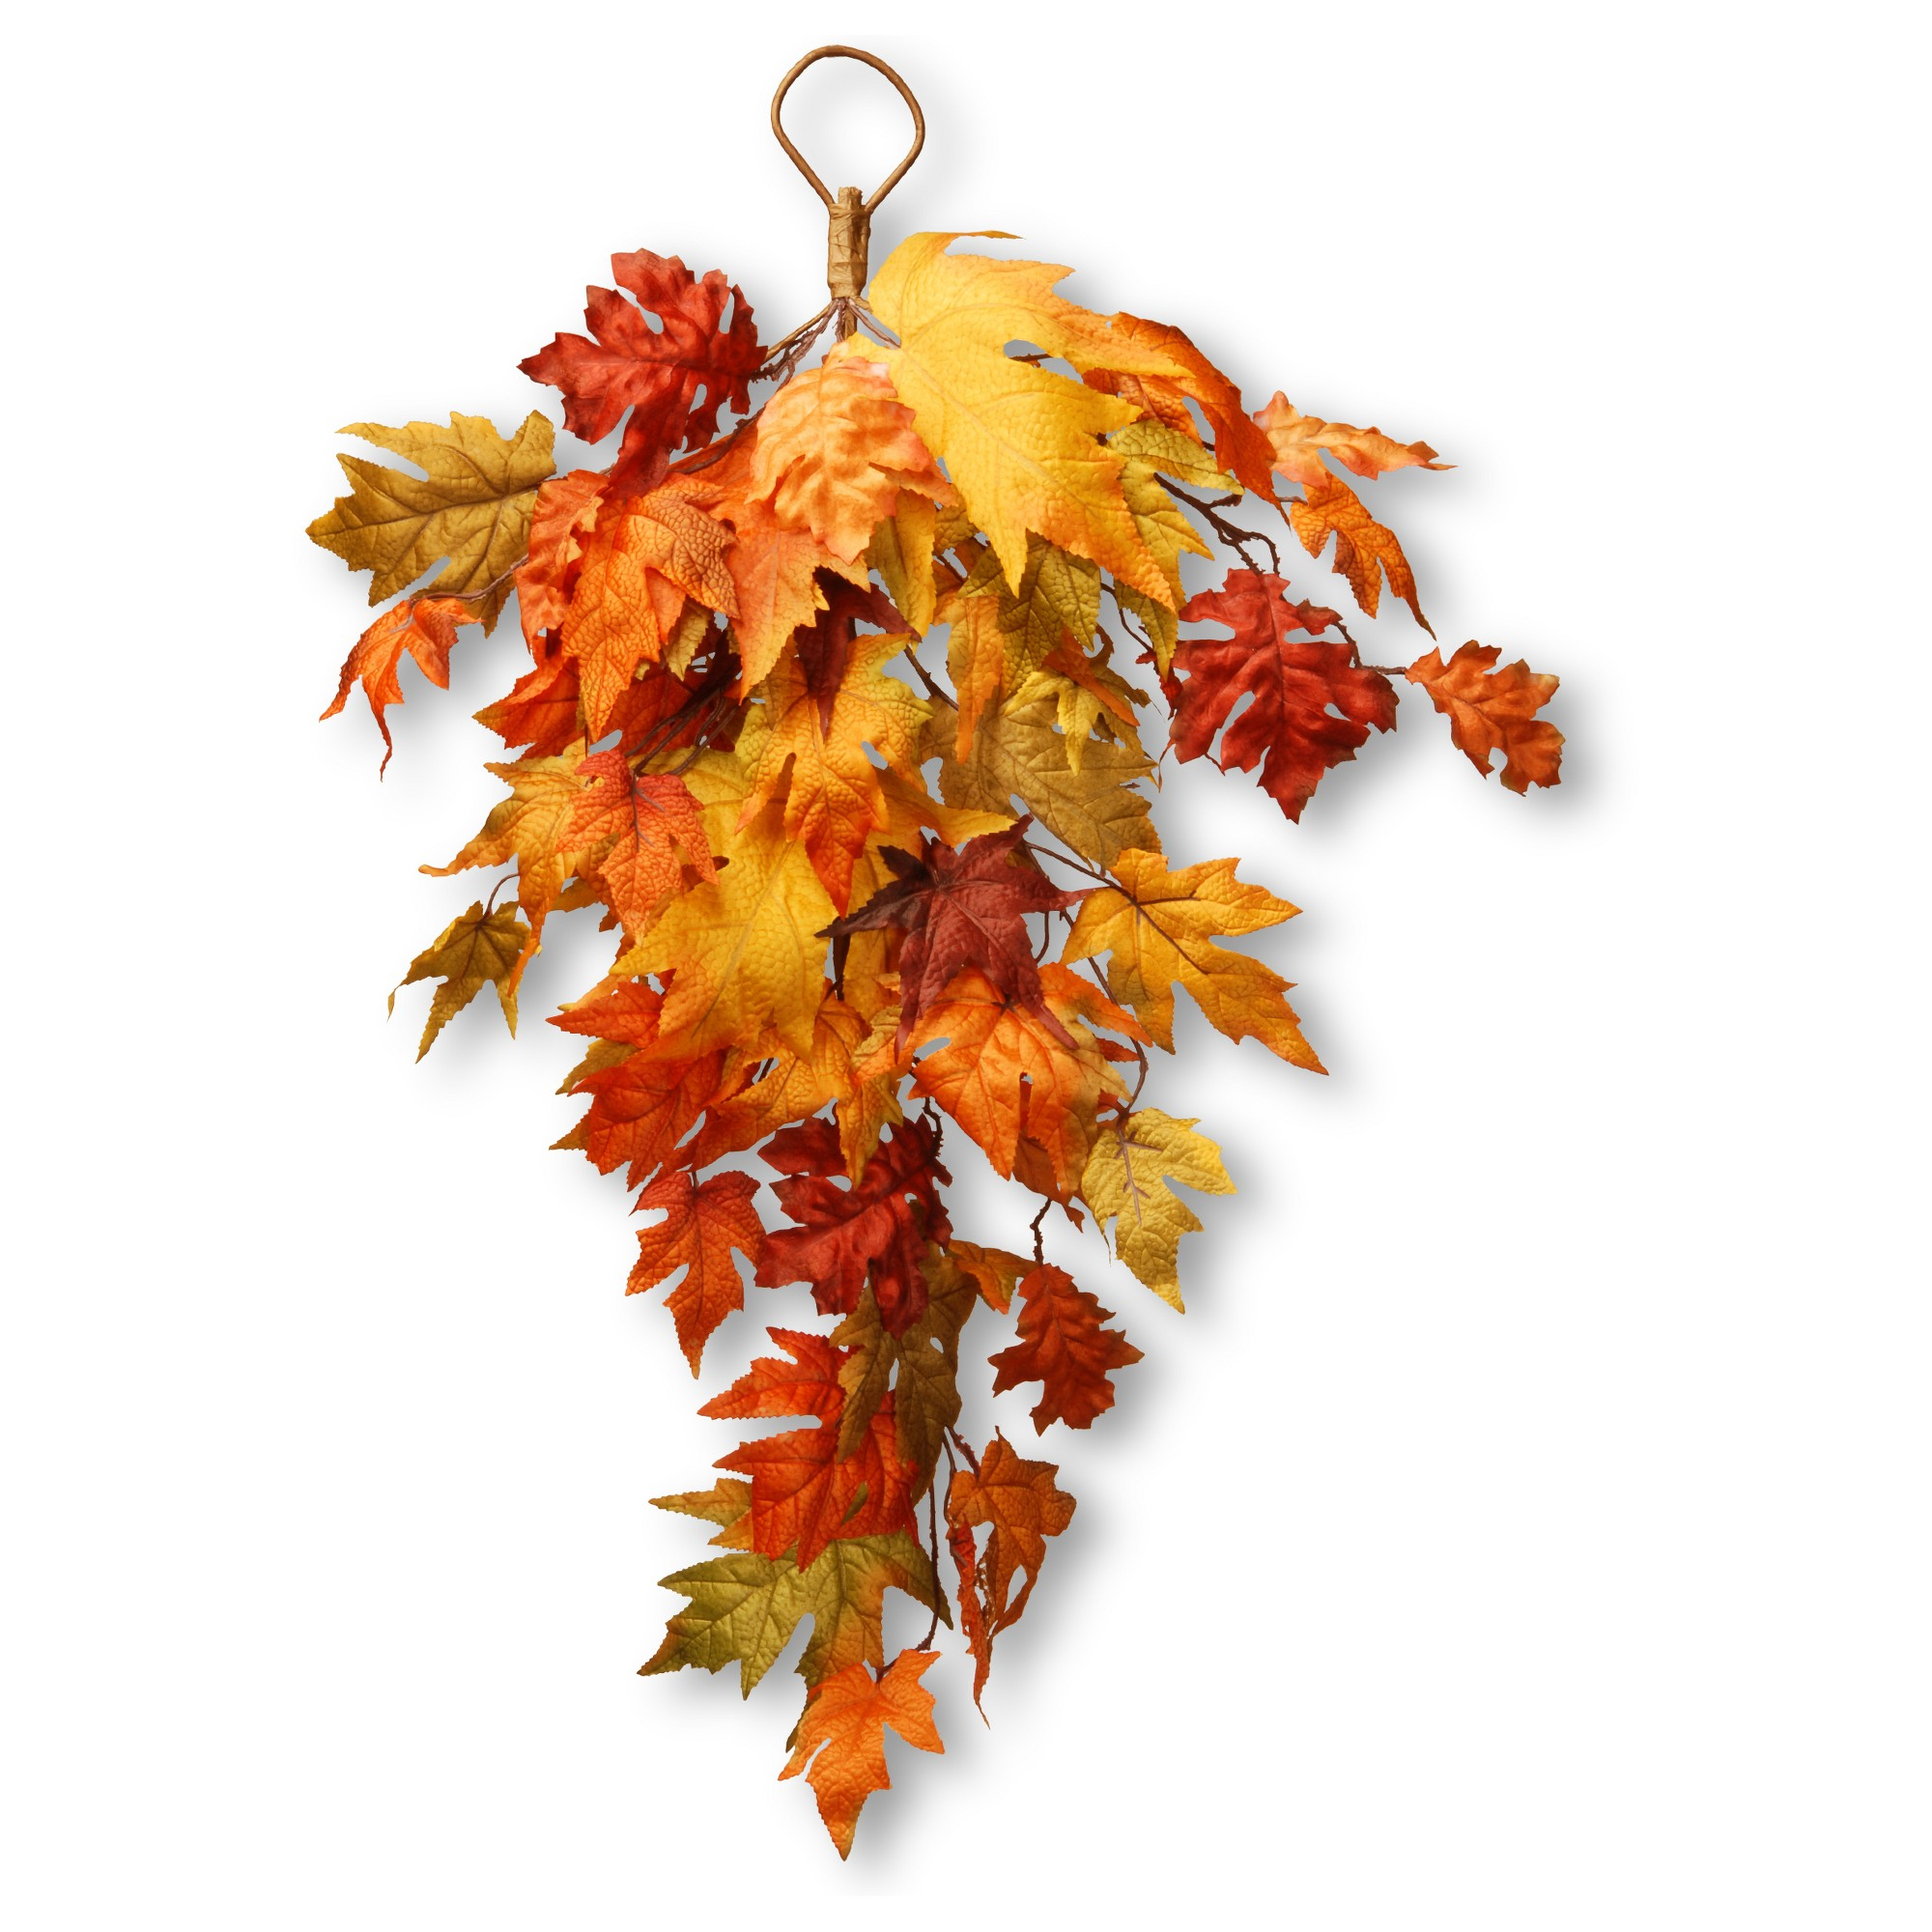 30 Maple Leaf Teardrop - National Tree Company, Orange Dream